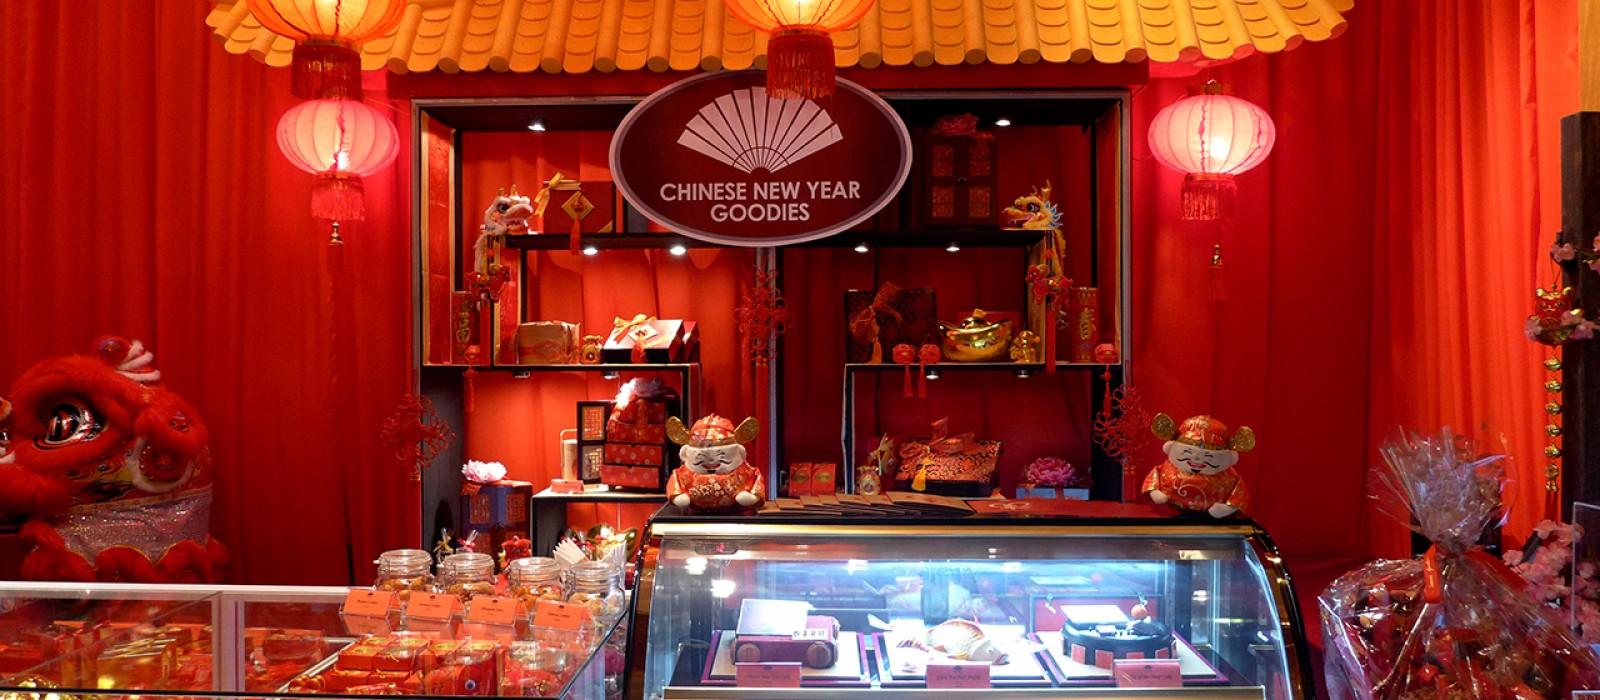 Chinese New Year Set Menu at Lai Po Heen, Mandarin Oriental Kuala Lumpur